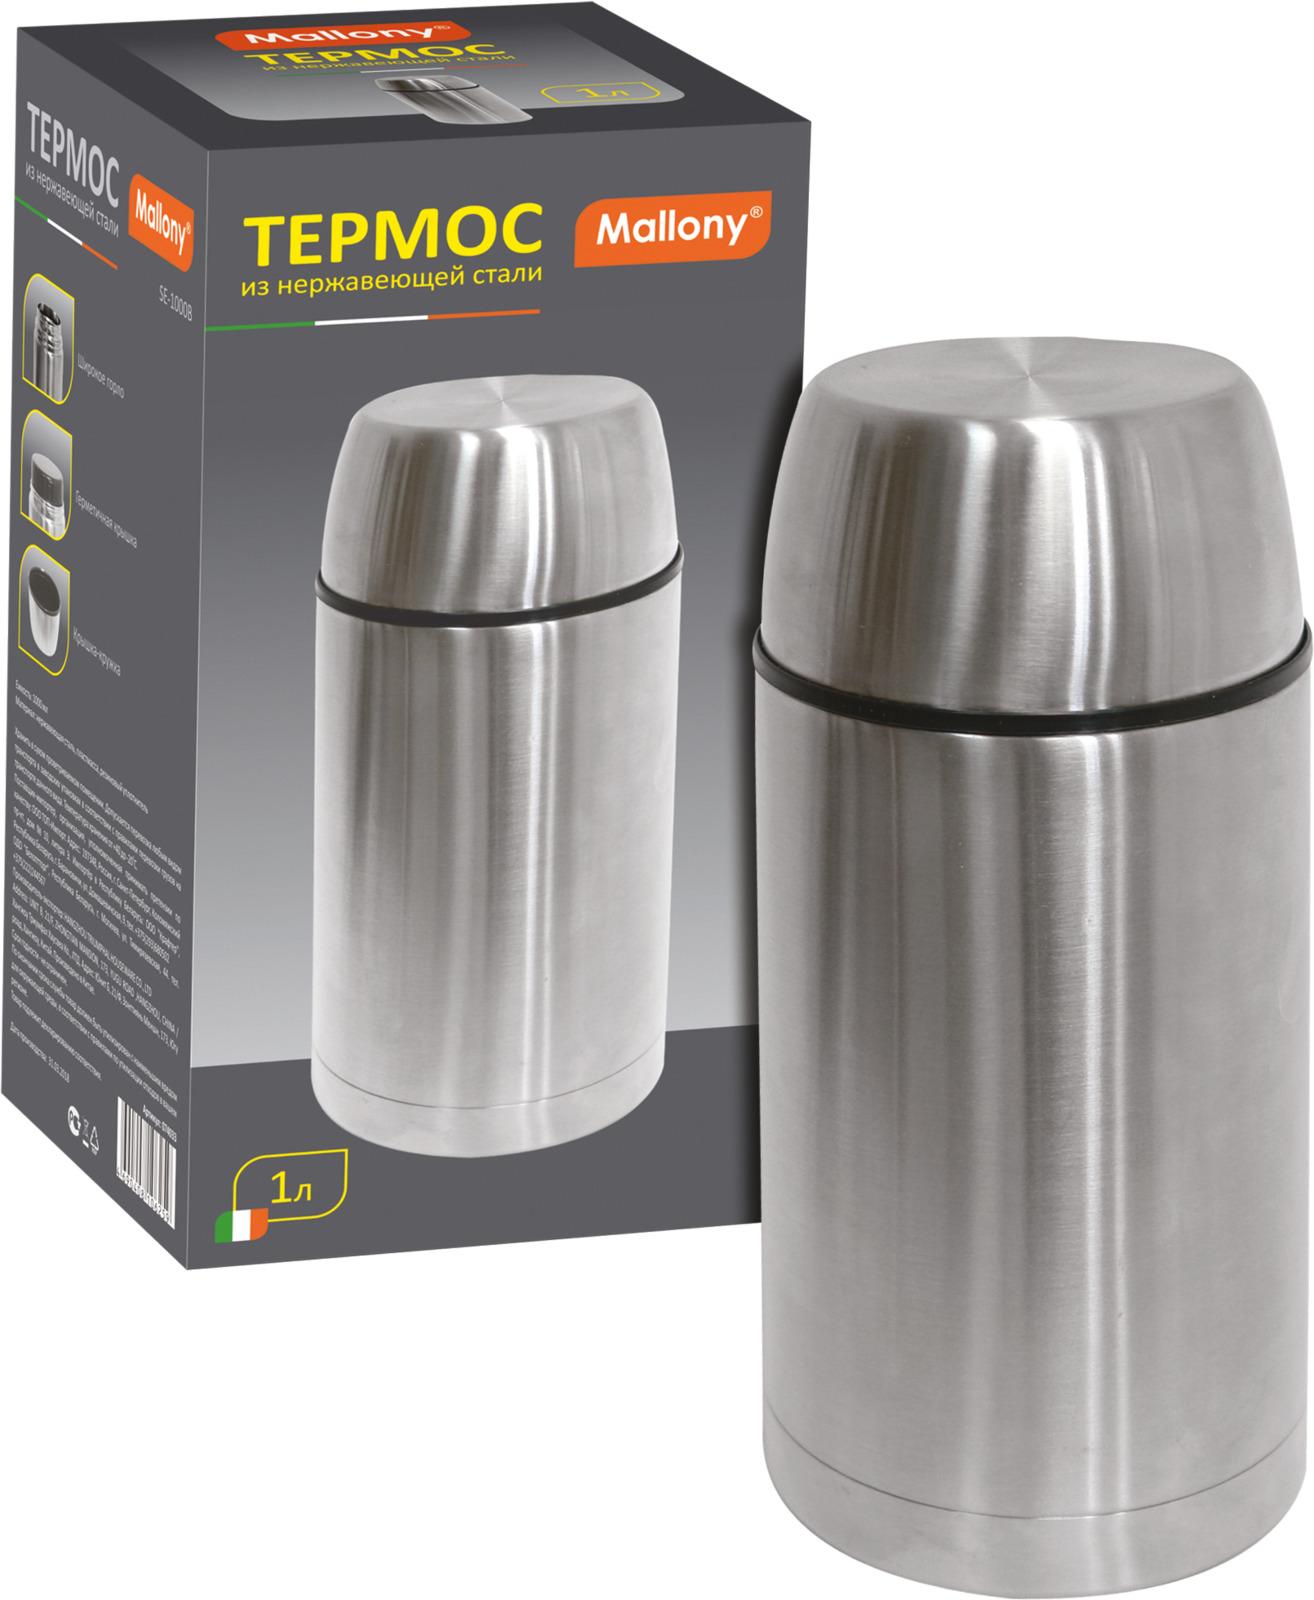 Термос Mallony, цвет: серебристый, 1 л mallony термос t85100 1 0 л широкое горло mallony